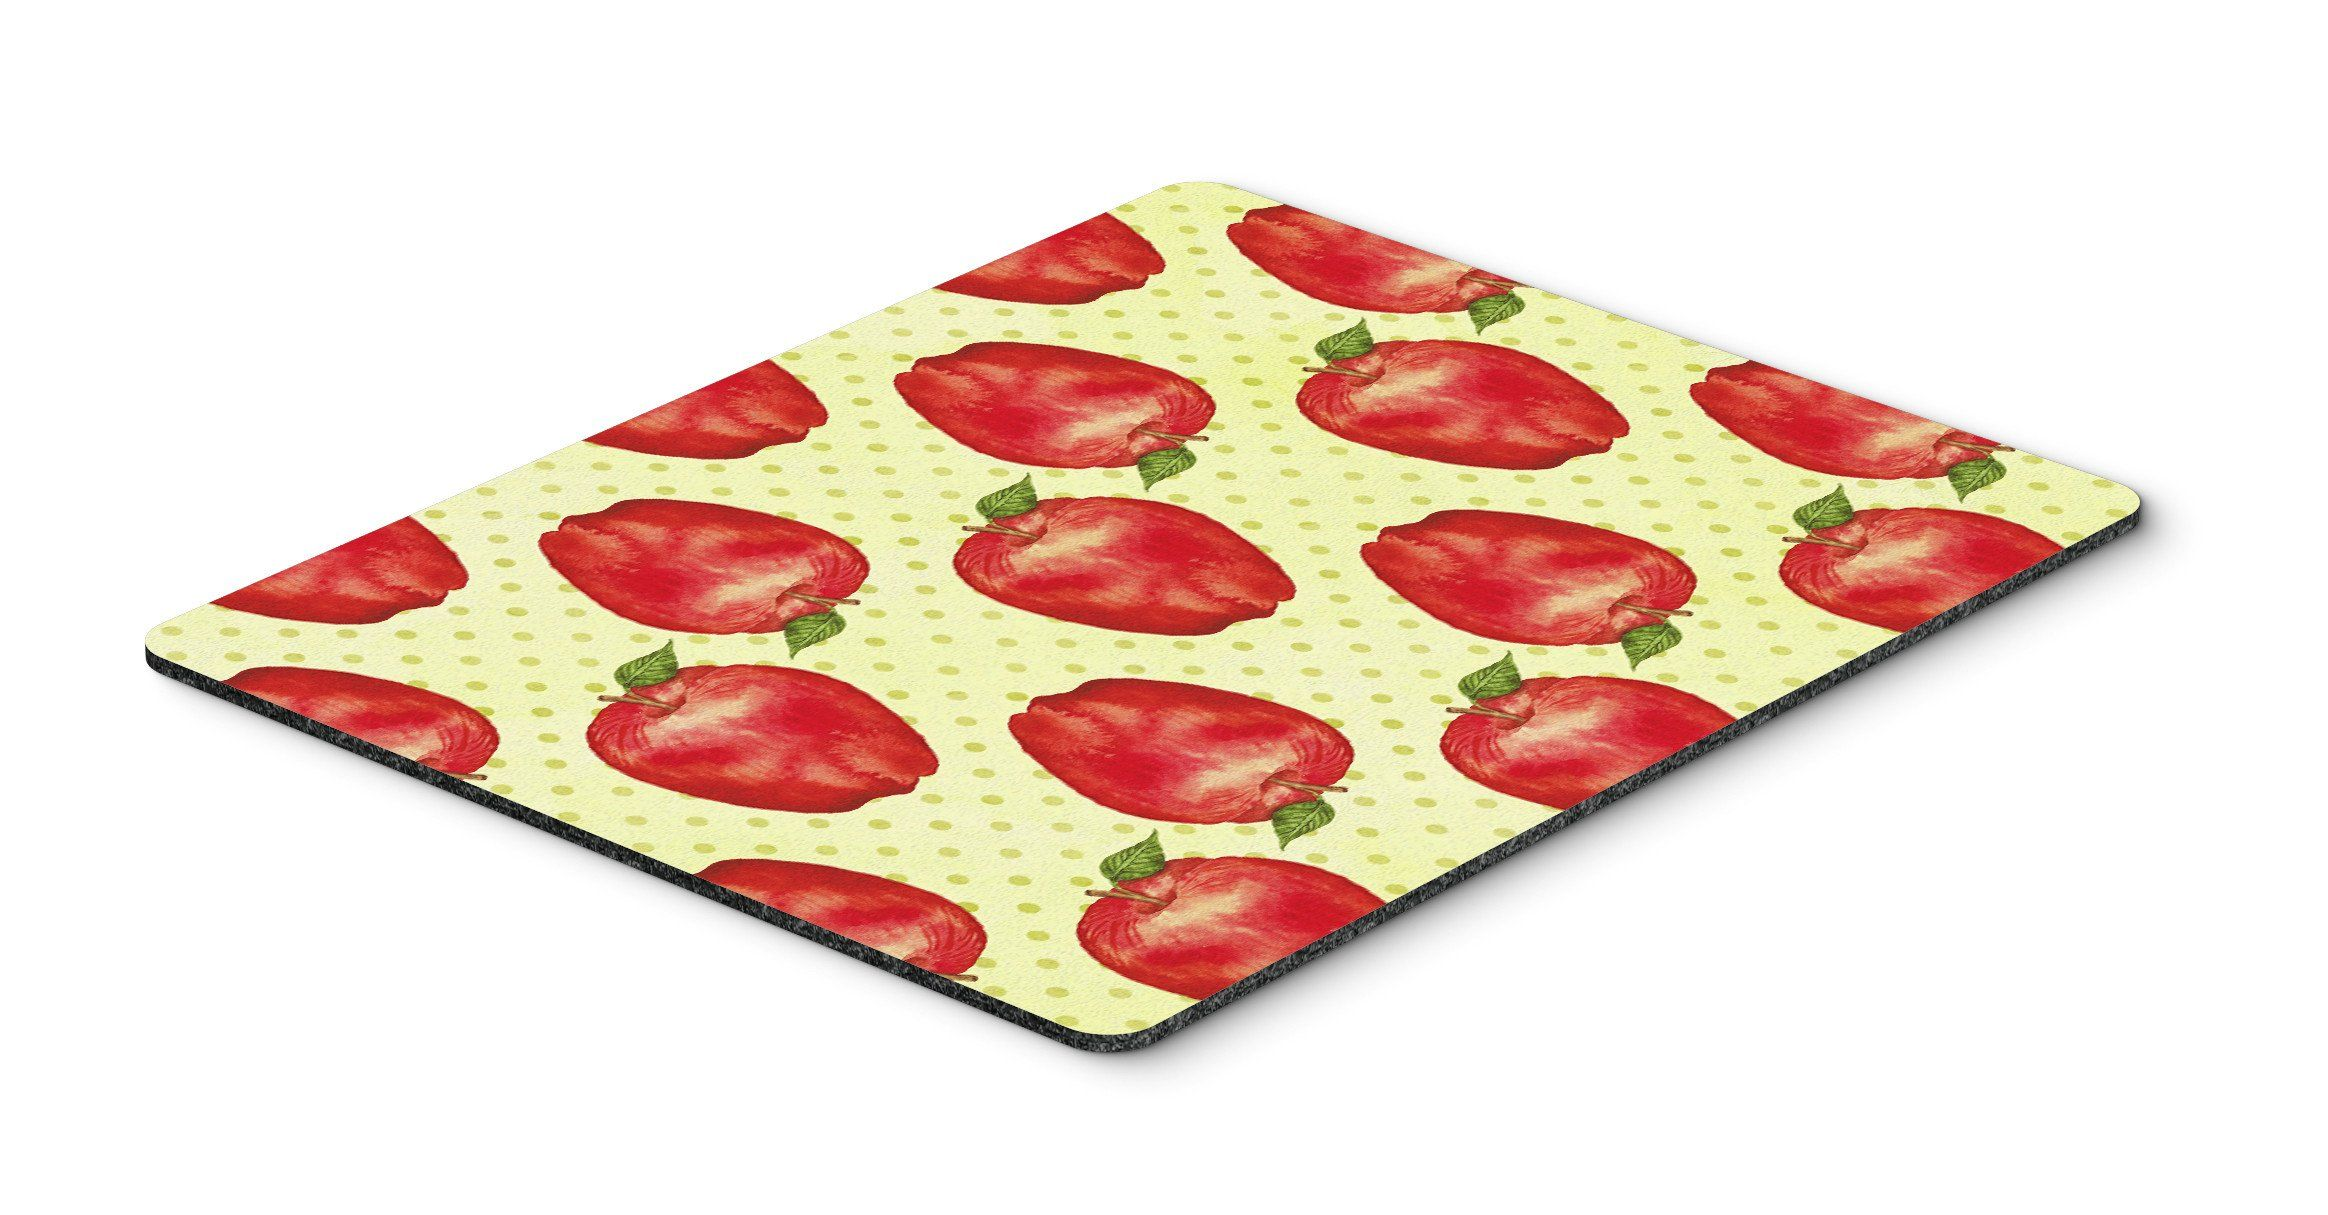 Watercolor Apples and Polkadots Mouse Pad, Hot Pad or